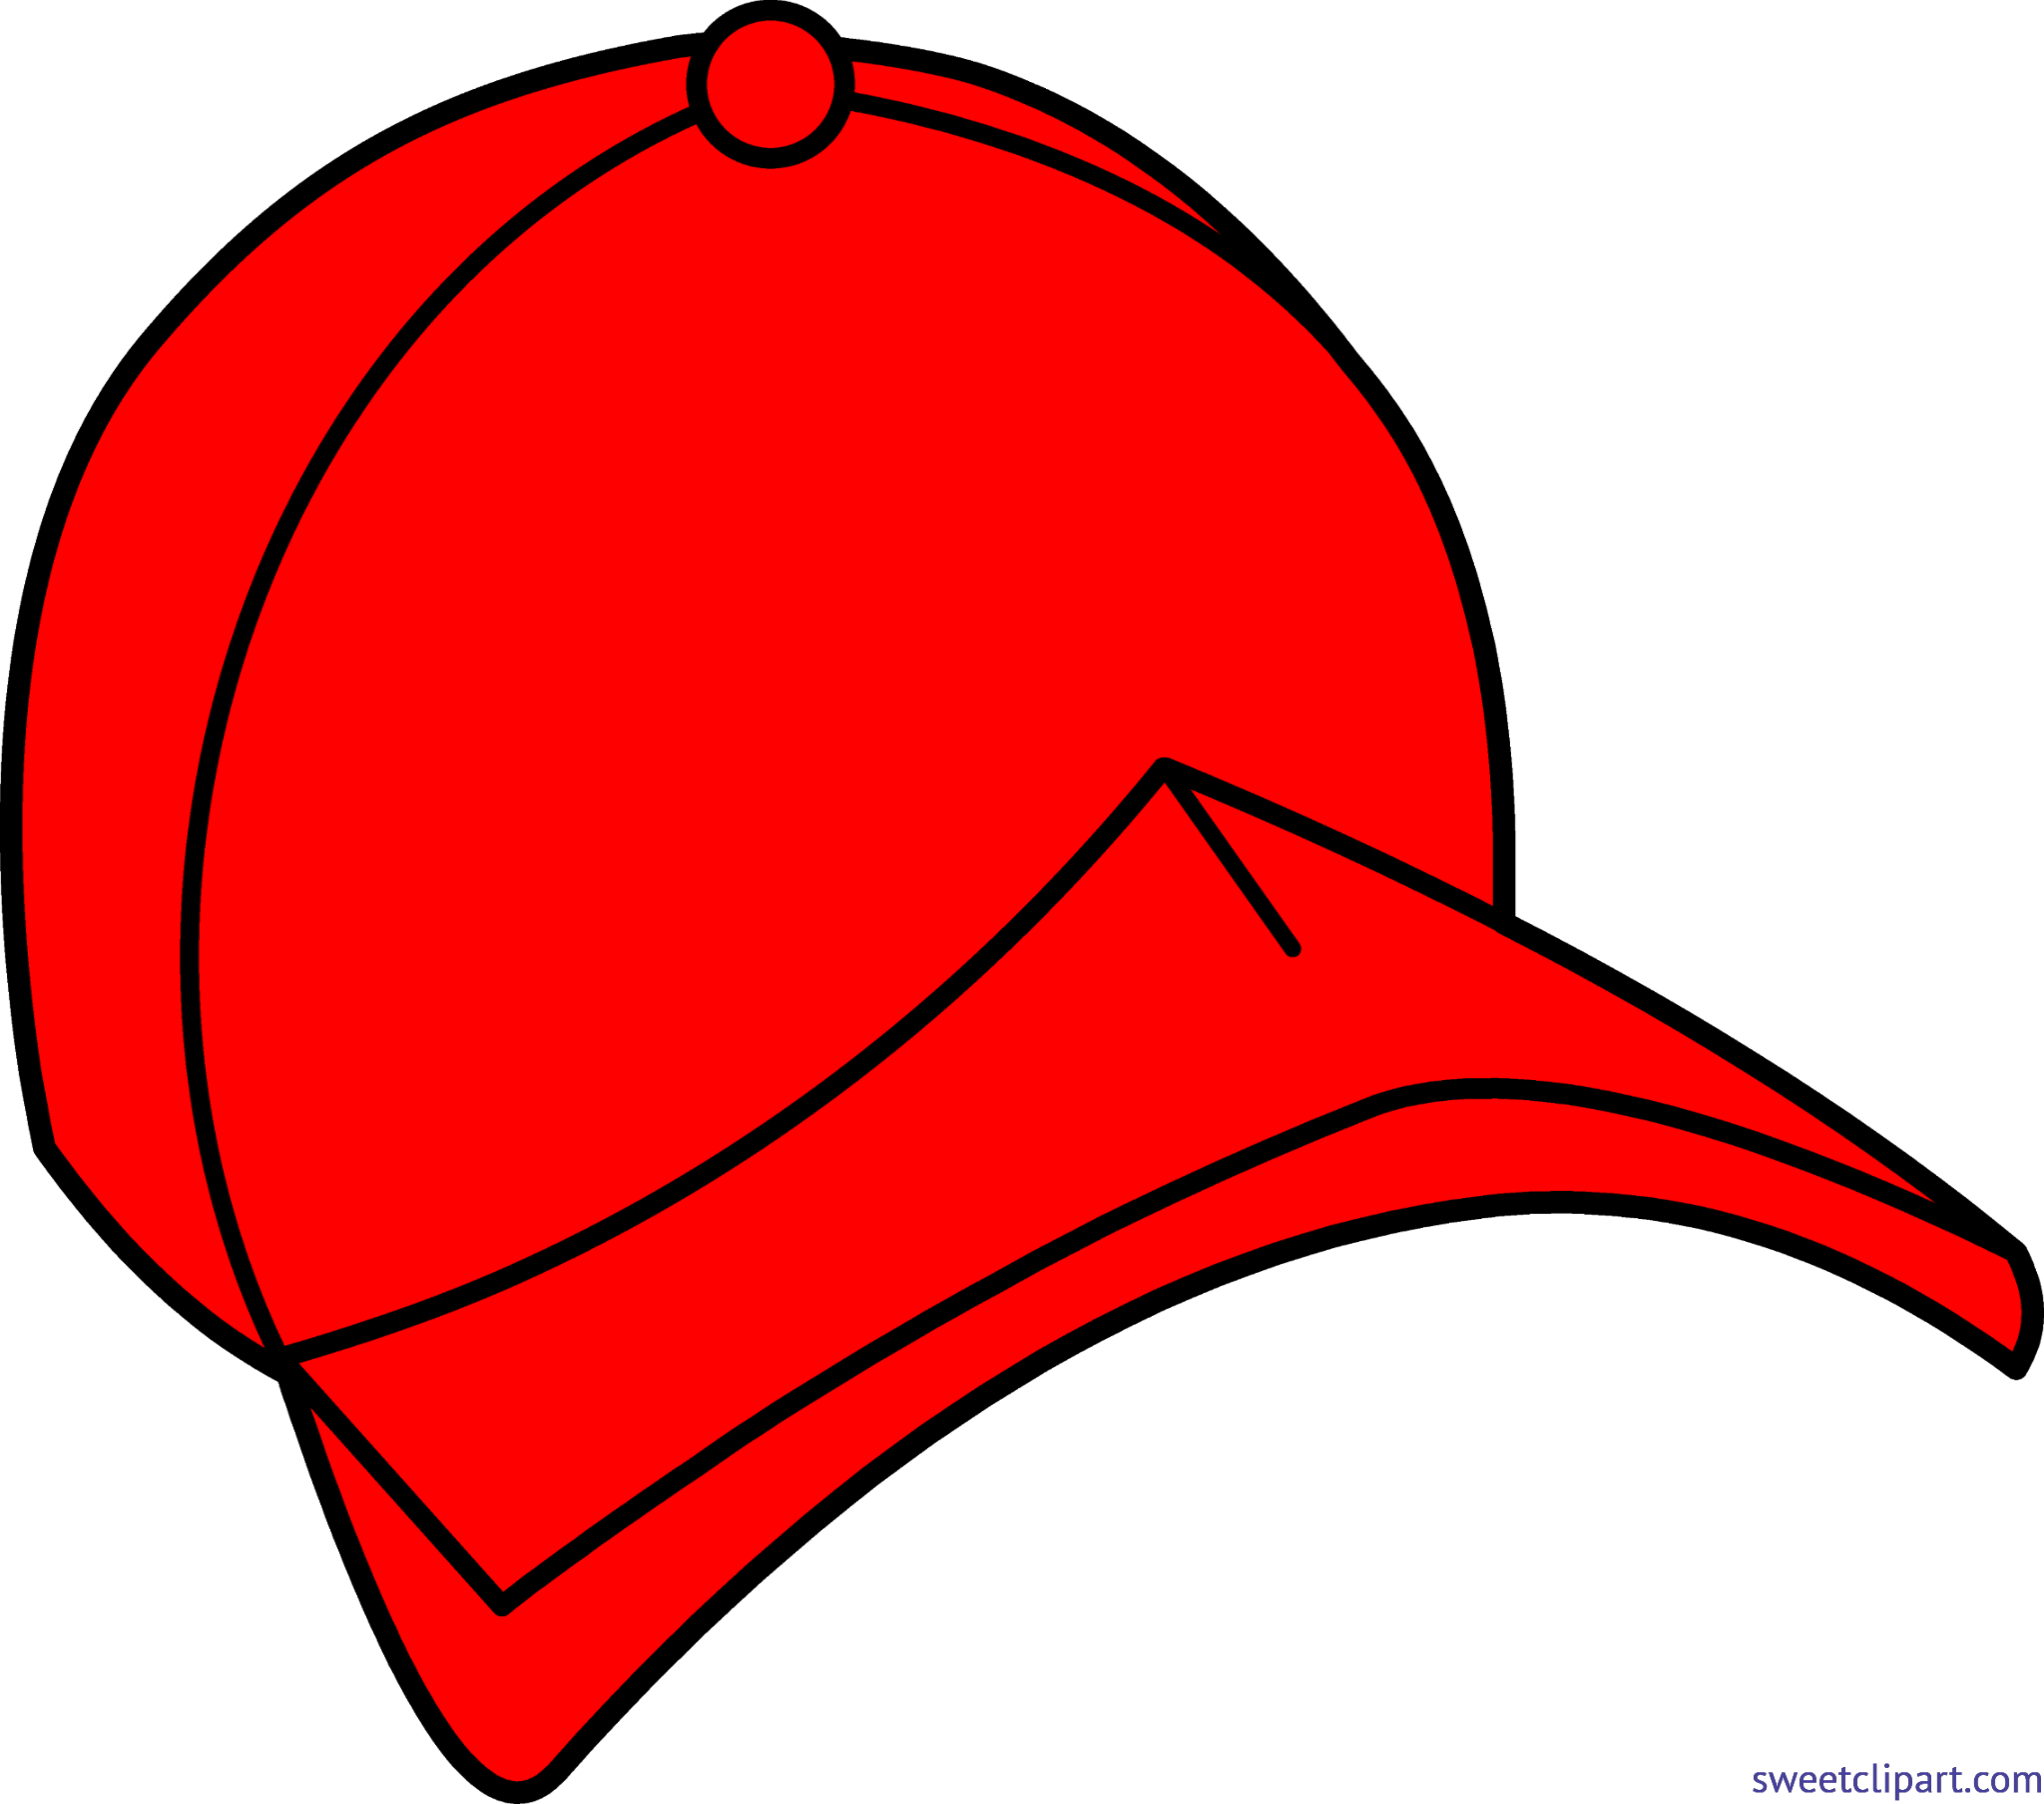 Clipart baseball hat with logo vector royalty free Baseball Cap 2 Red Clip Art - Sweet Clip Art vector royalty free